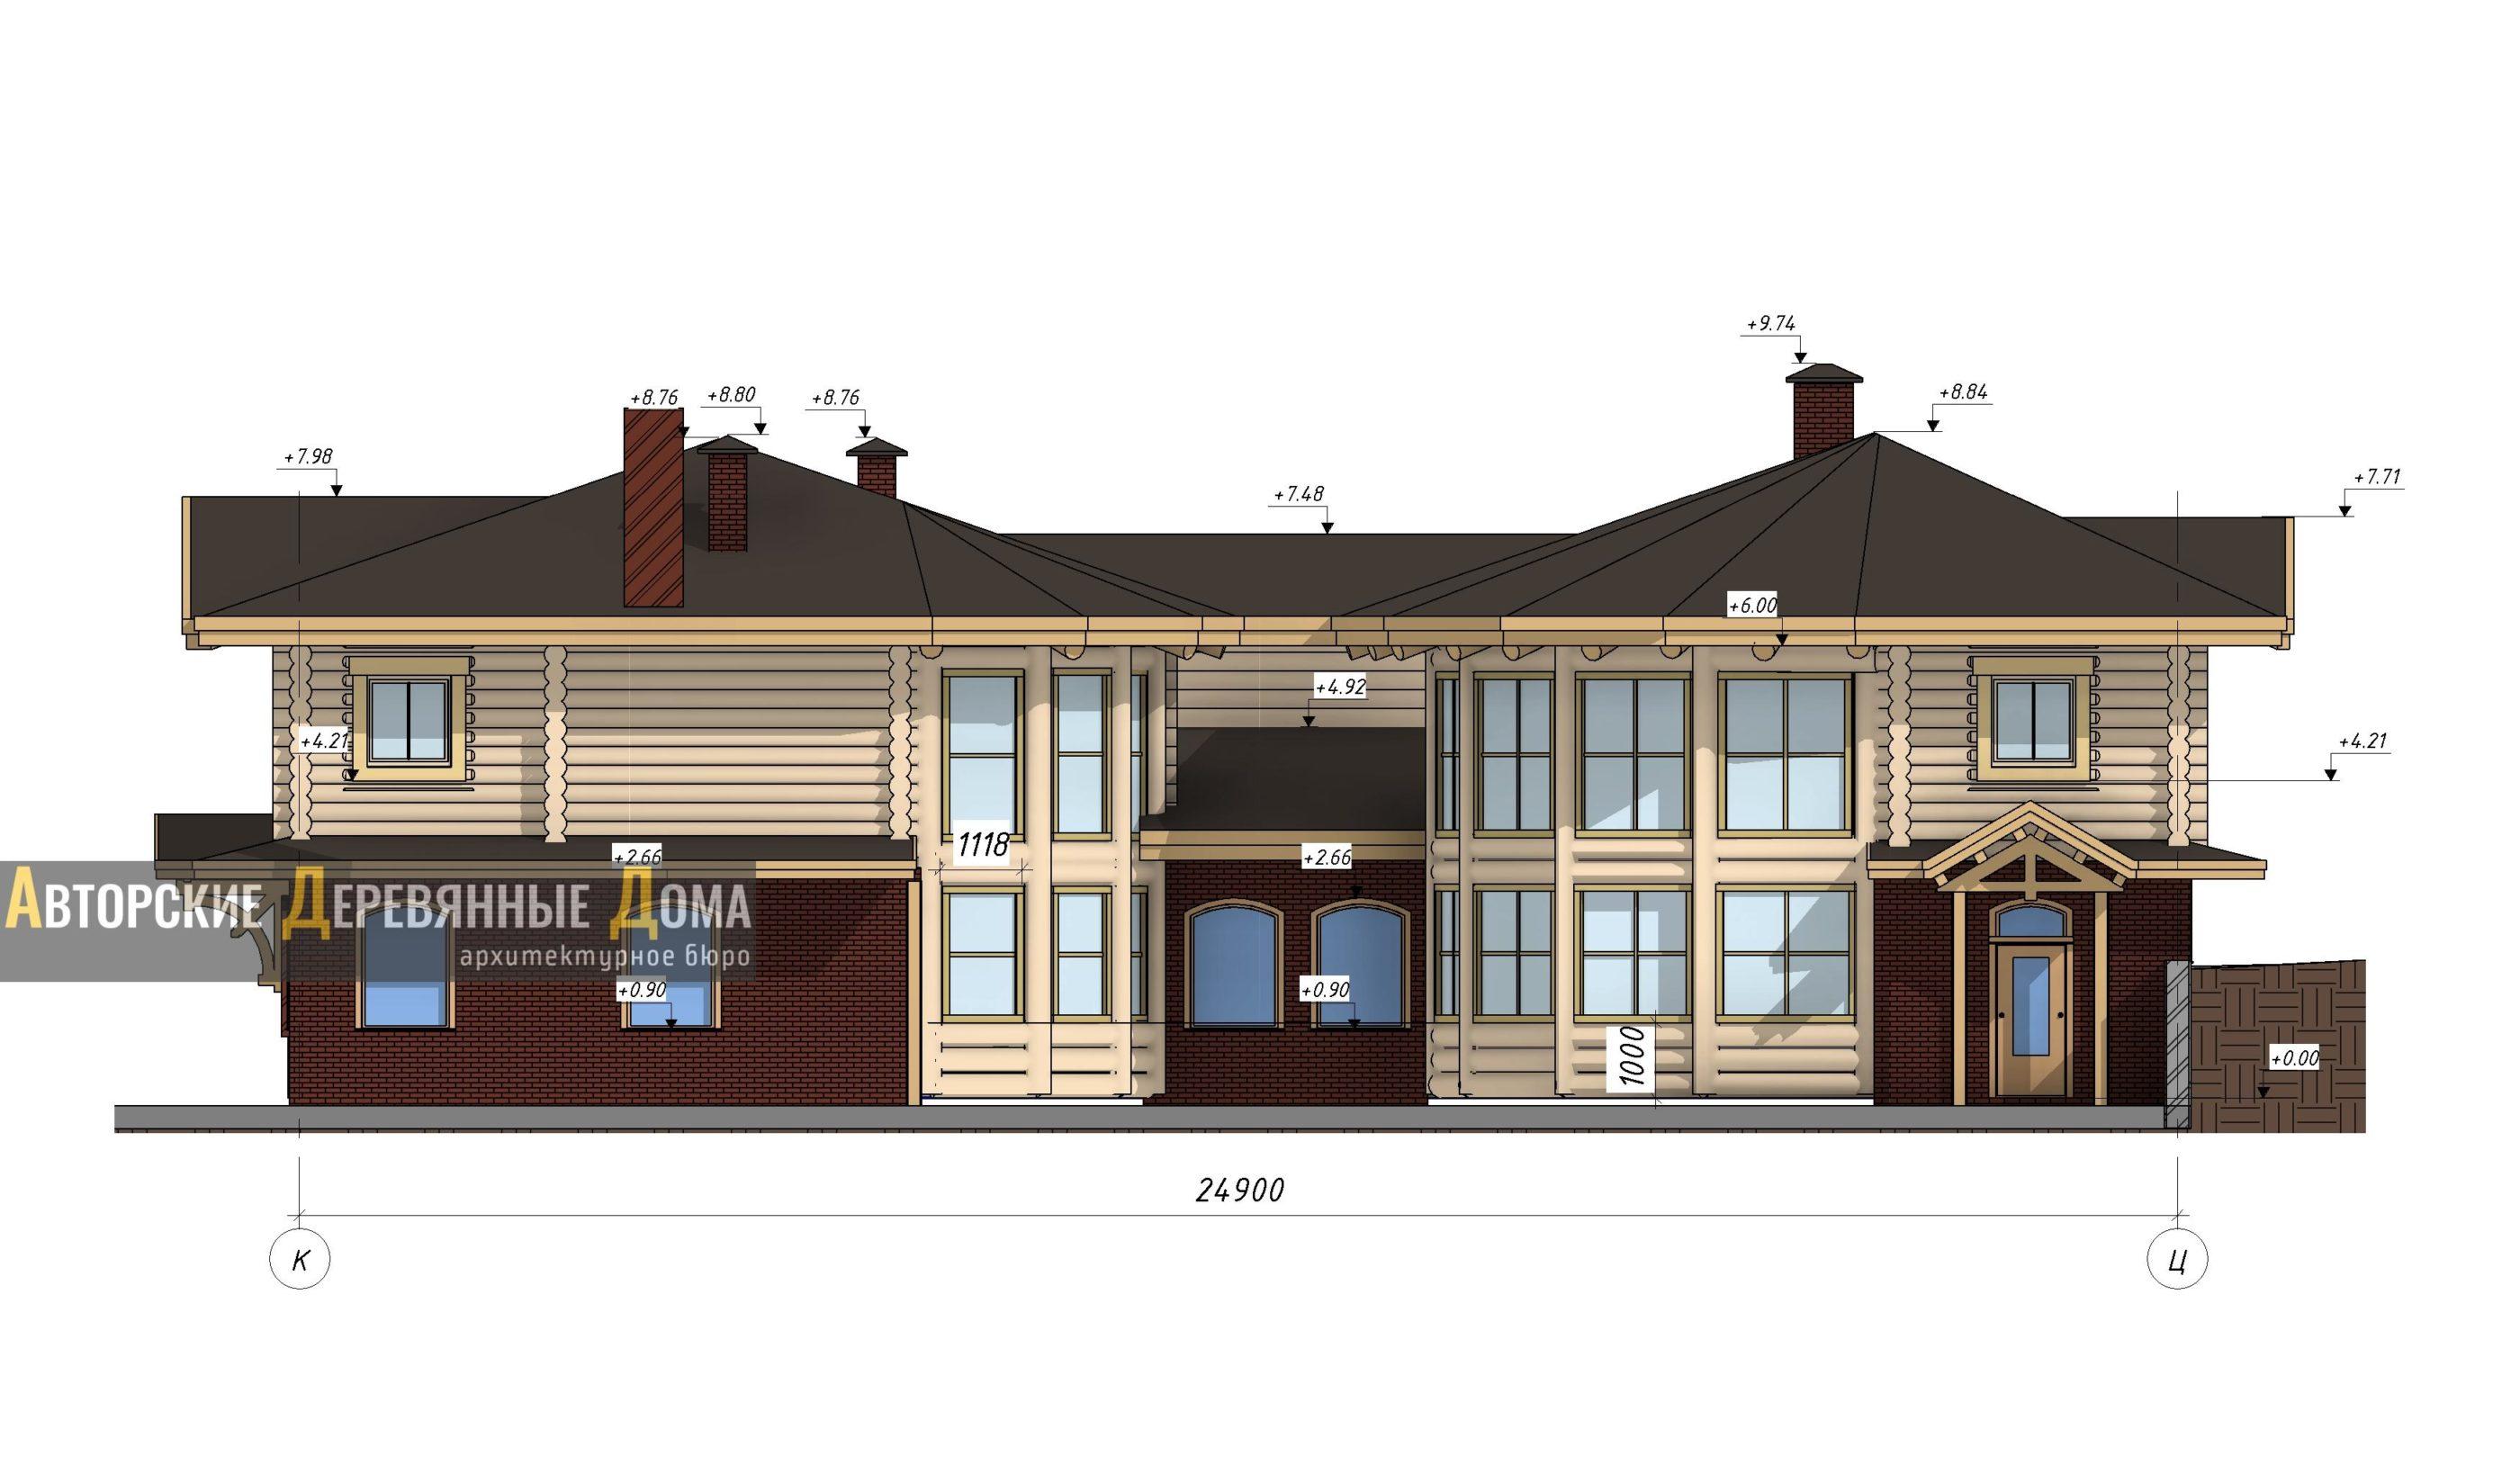 проект строительства центра реабилитации. Фасад 1